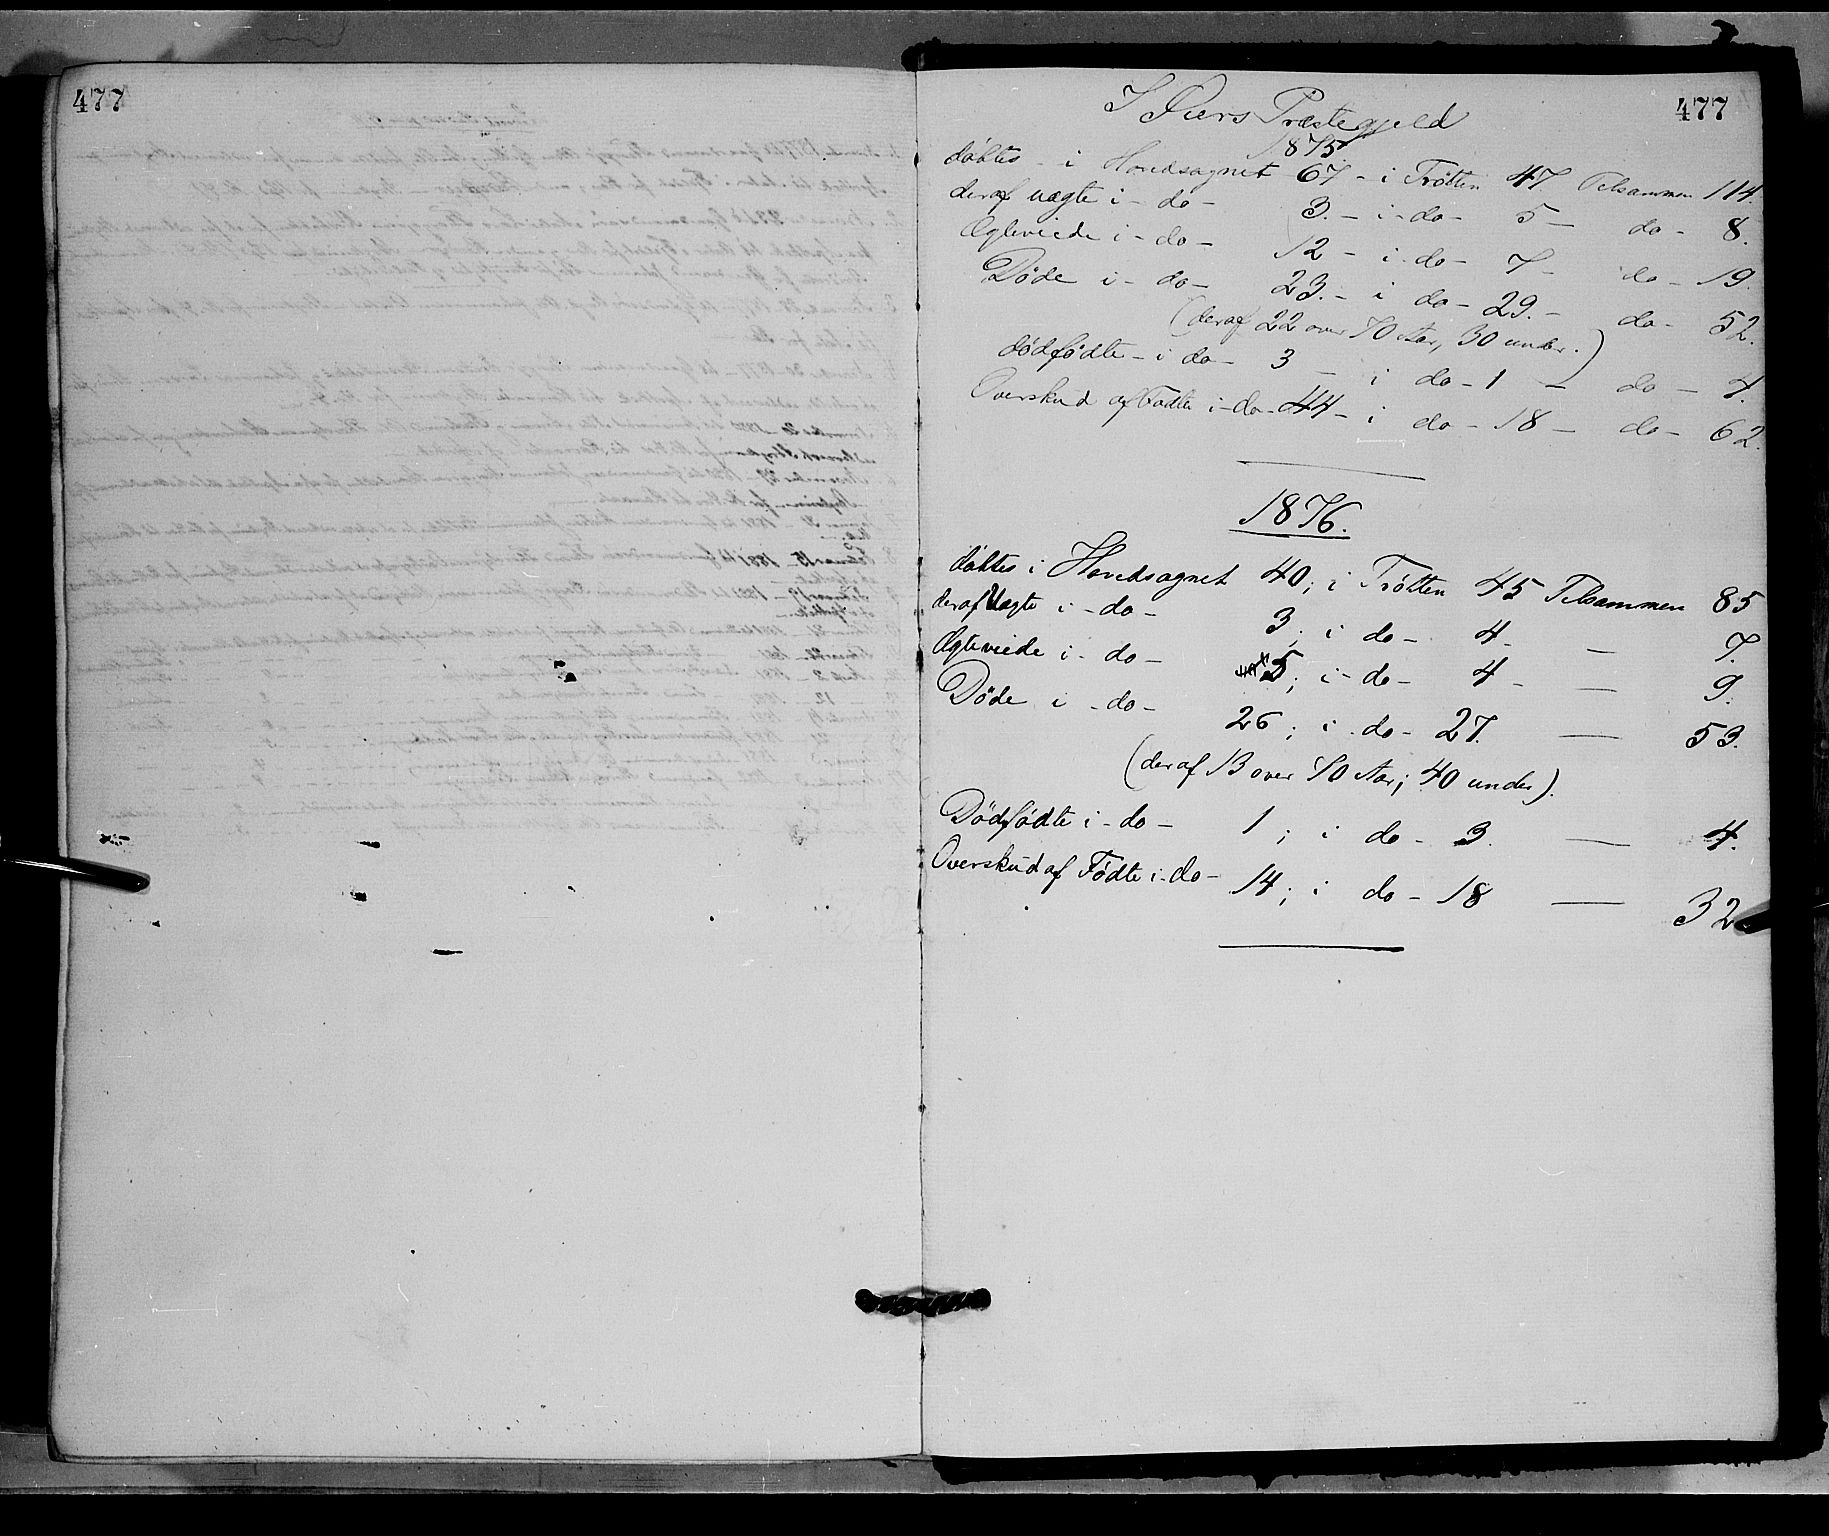 SAH, Øyer prestekontor, Ministerialbok nr. 7, 1875-1878, s. 477